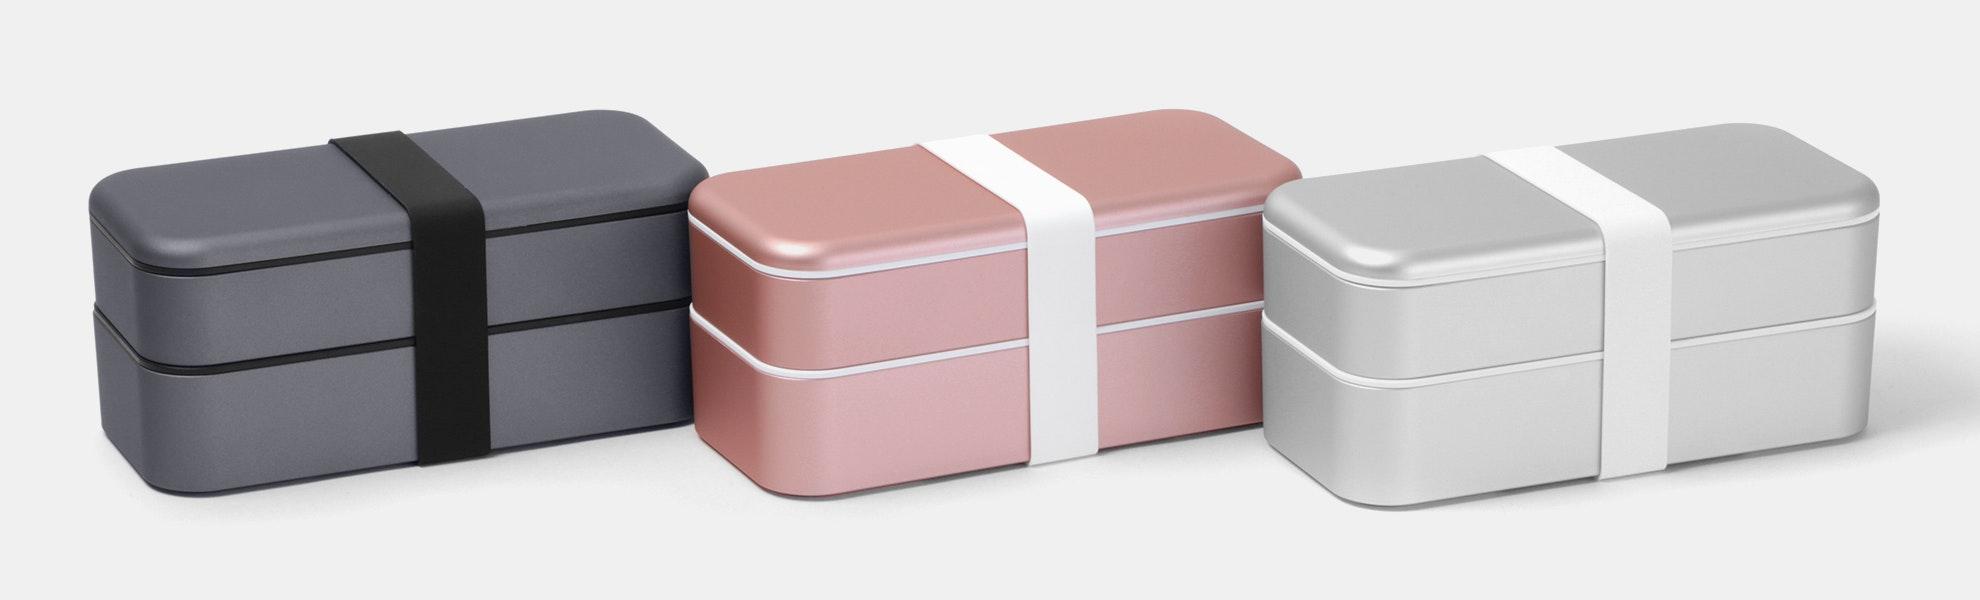 BentoStack EDC Storage Case